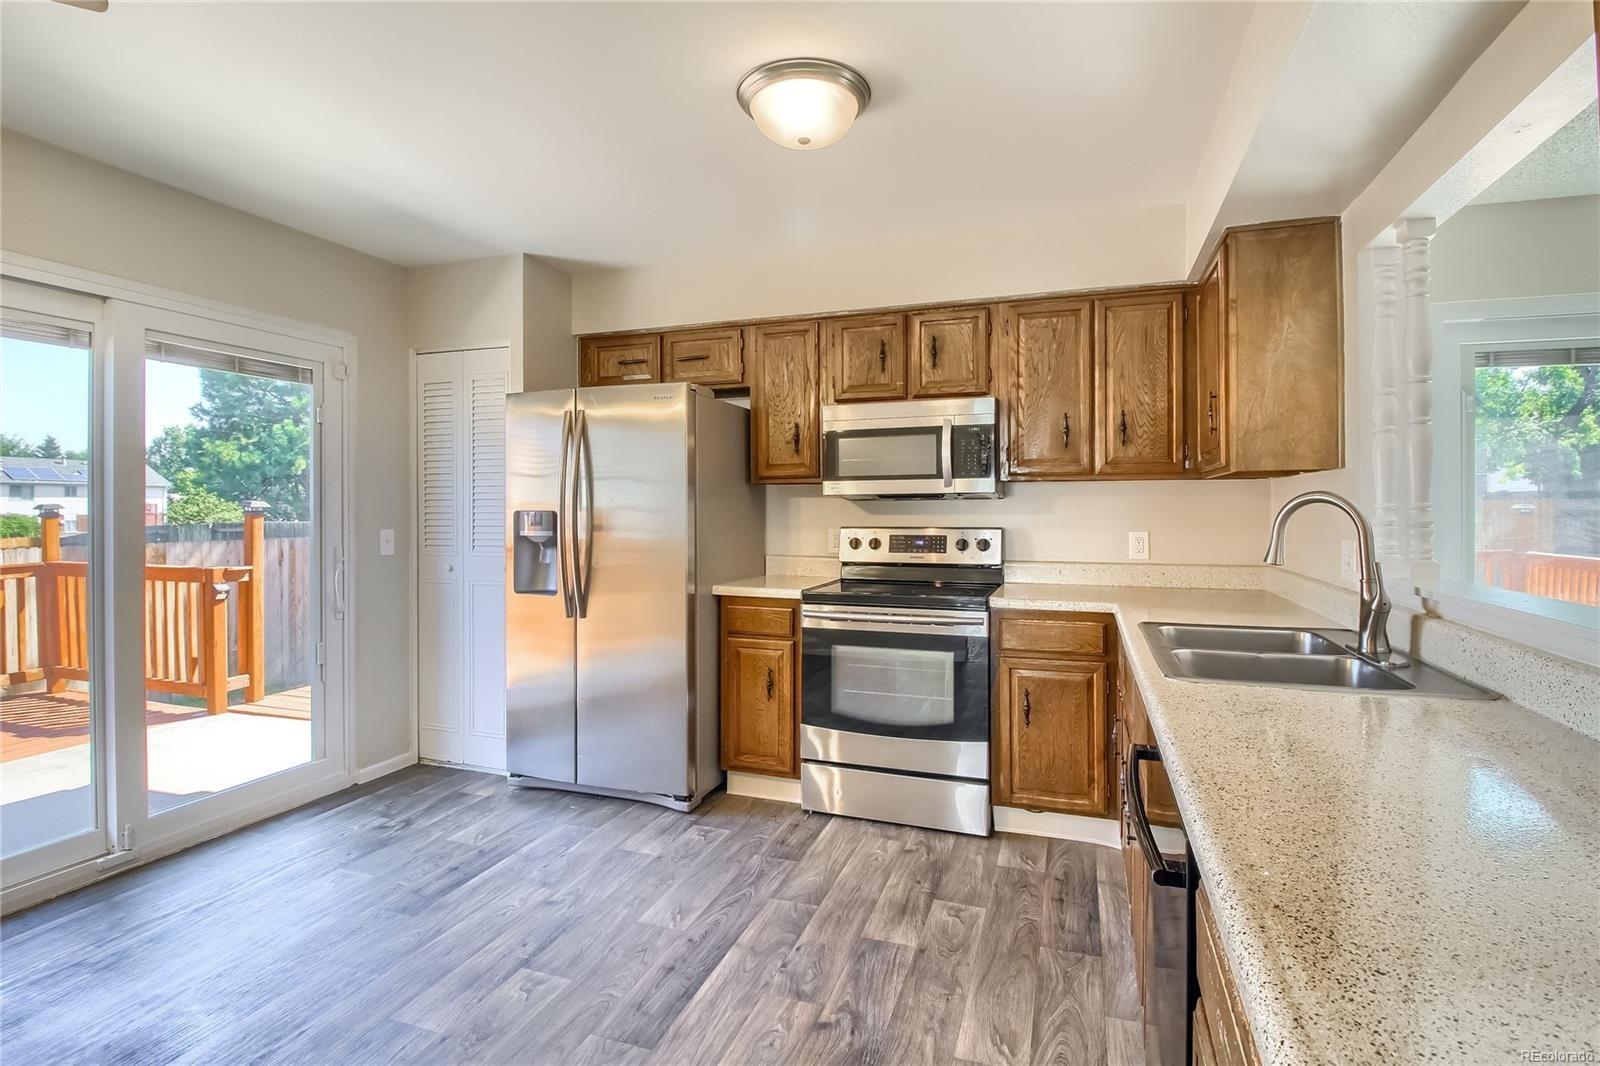 MLS# 4817896 - 11 - 5080 Worchester Street, Denver, CO 80239